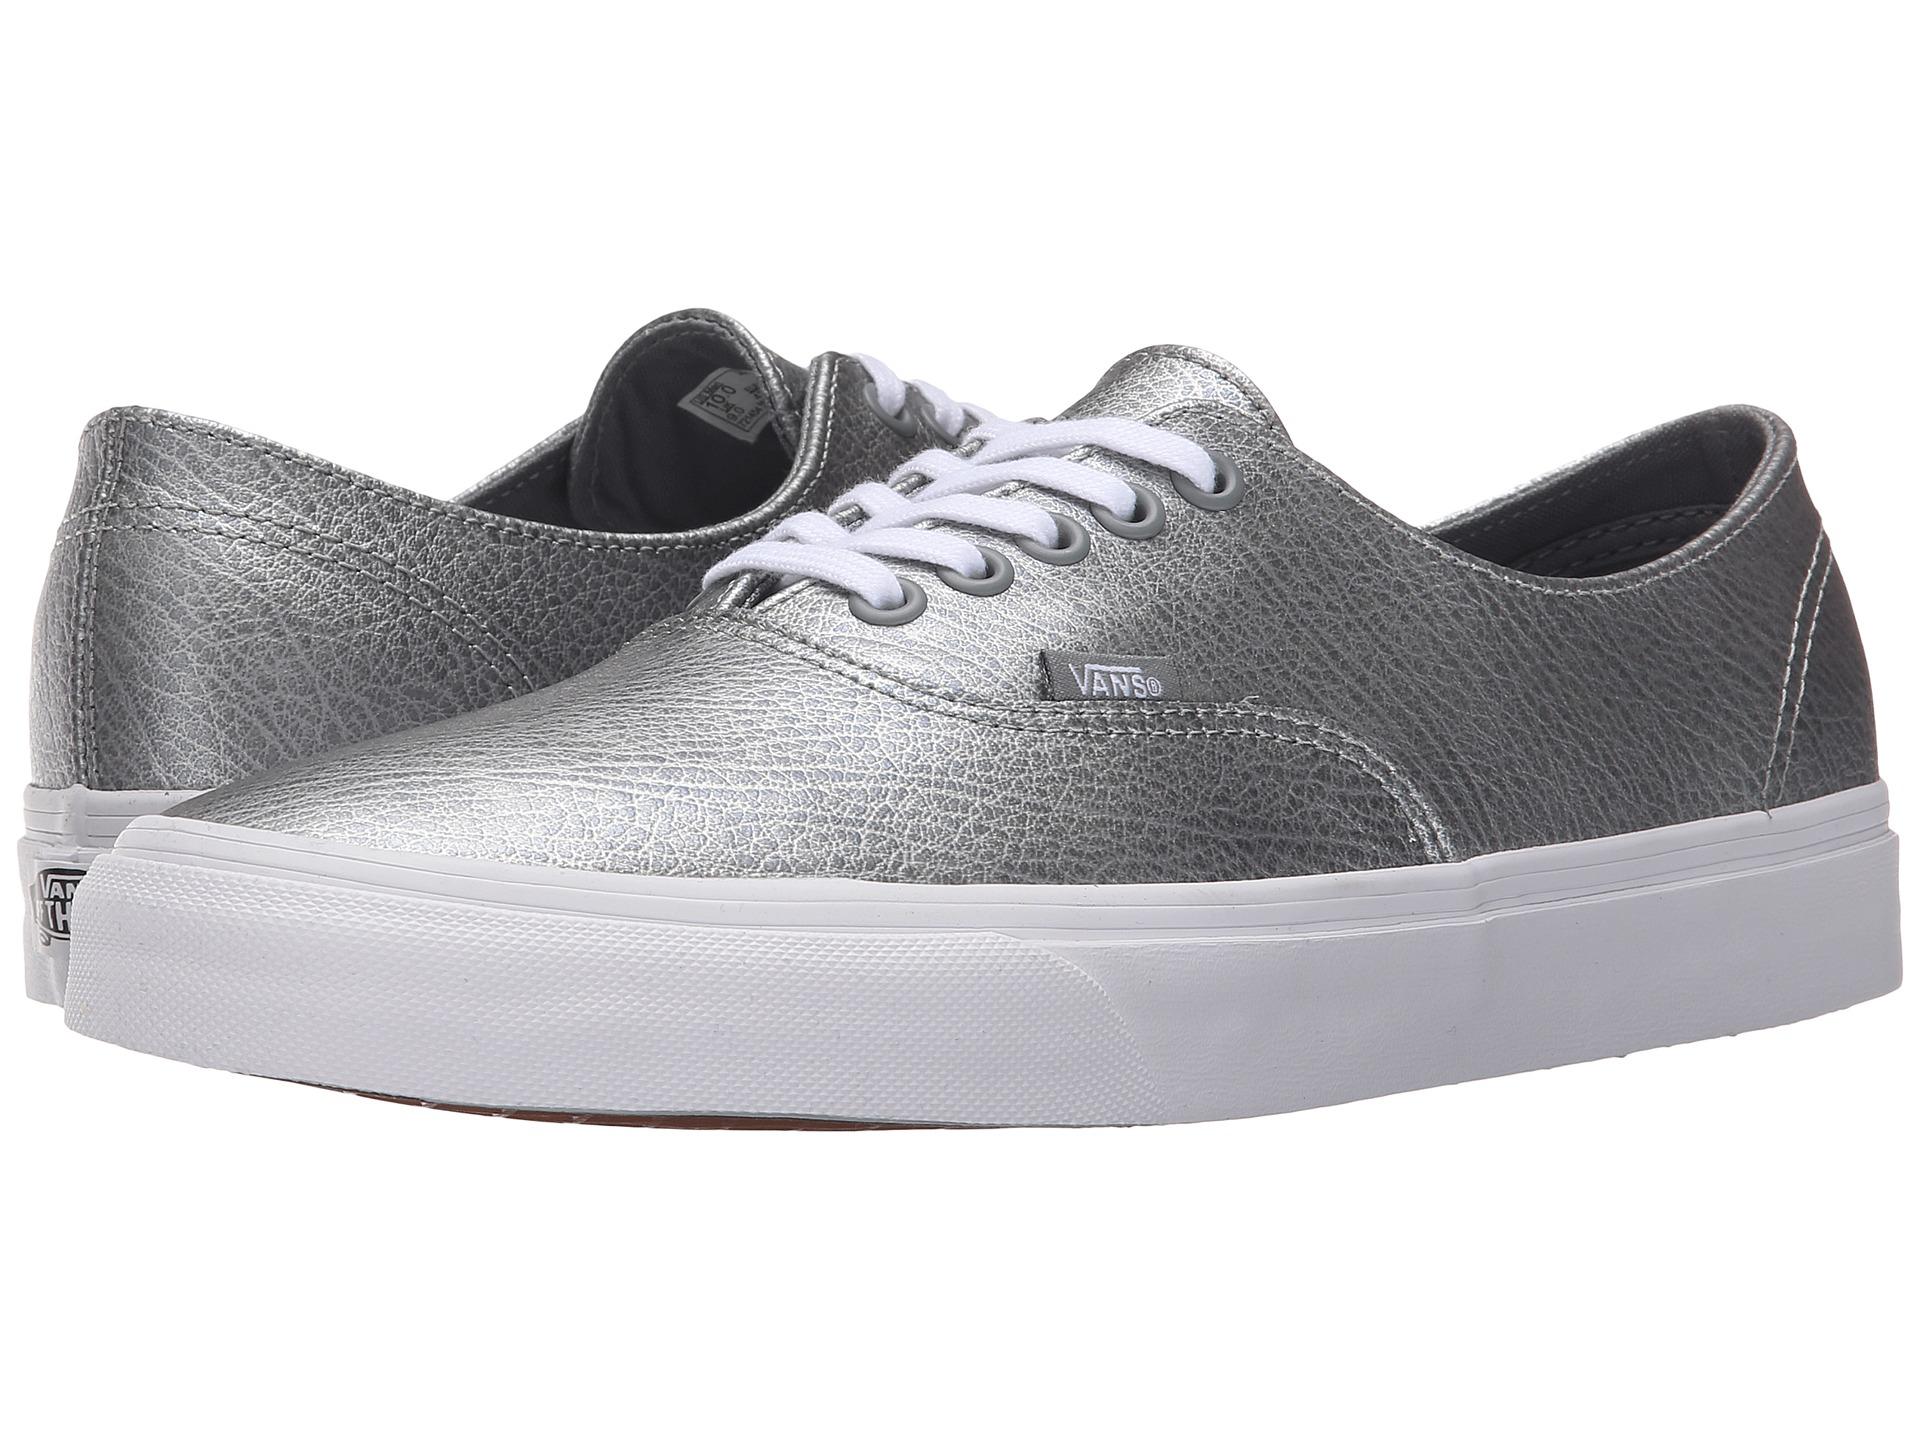 06898aaad19f Lyst - Vans Scotchgard® Authentic Decon in Gray